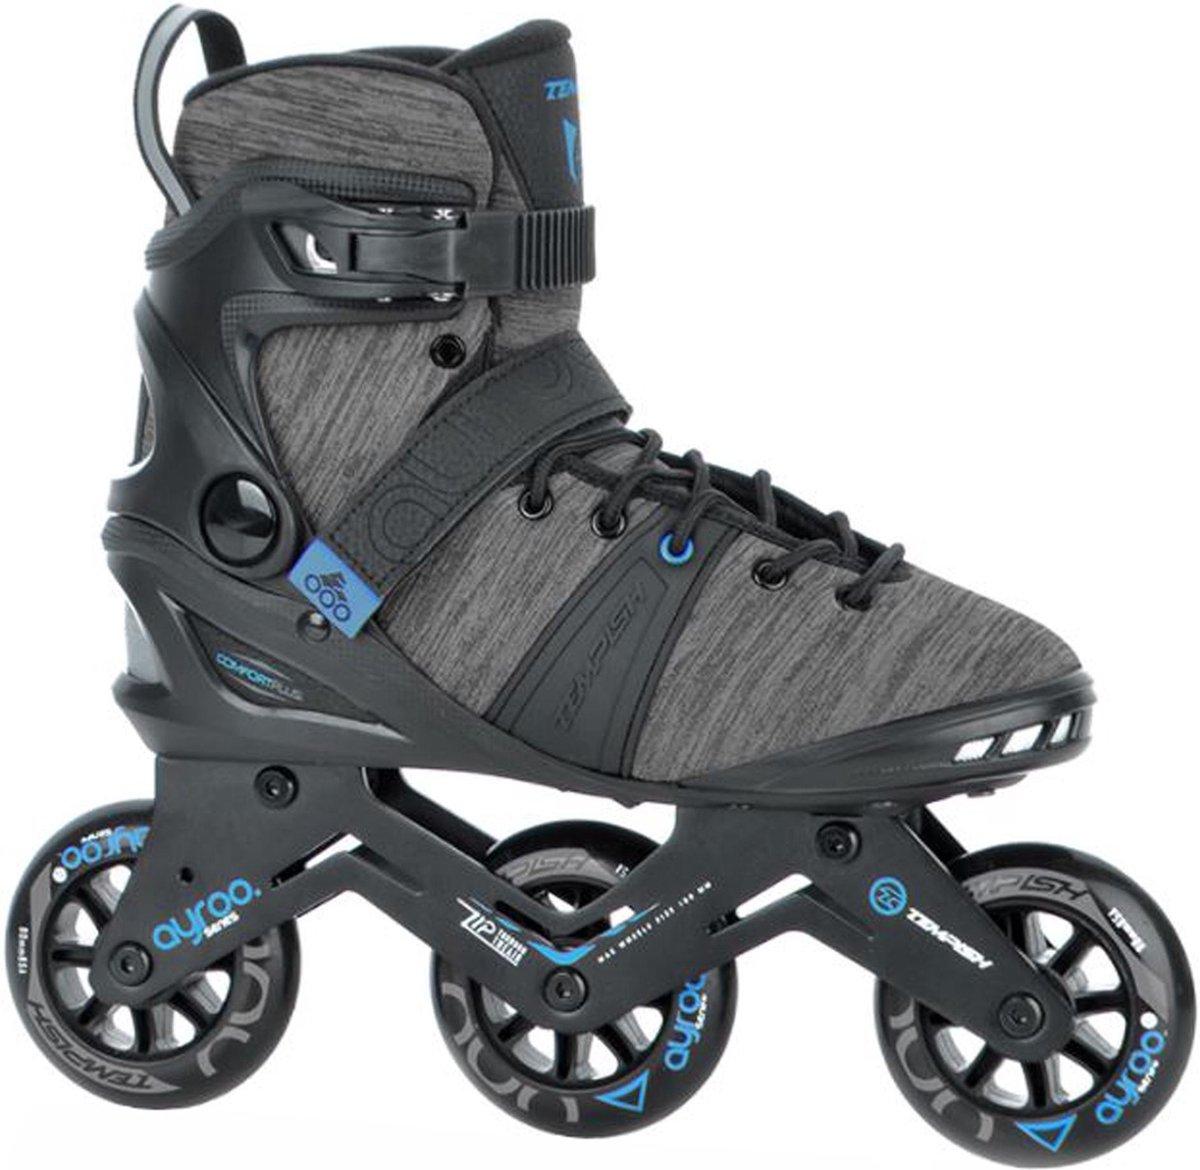 Tempish Ayroo 90 Inlineskates - Maat 45 - Unisex - zwart - grijs - blauw